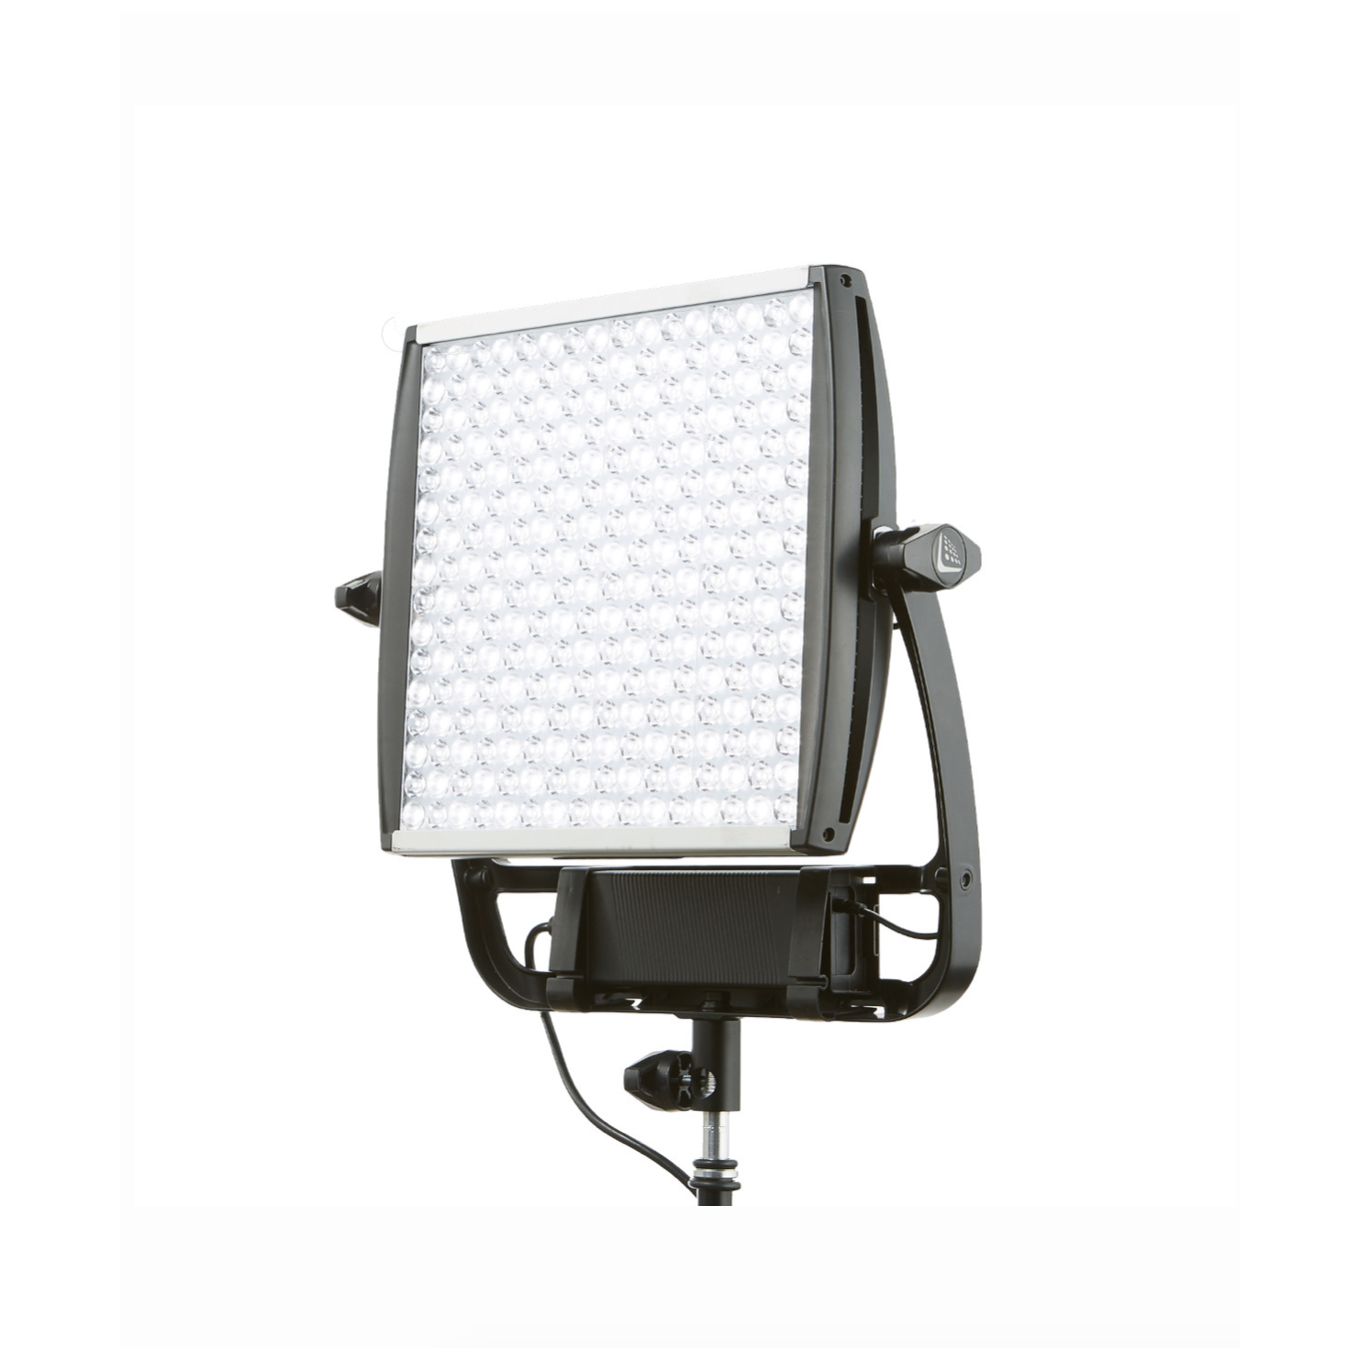 Litepanels Astra Bi-Focus LED Panel